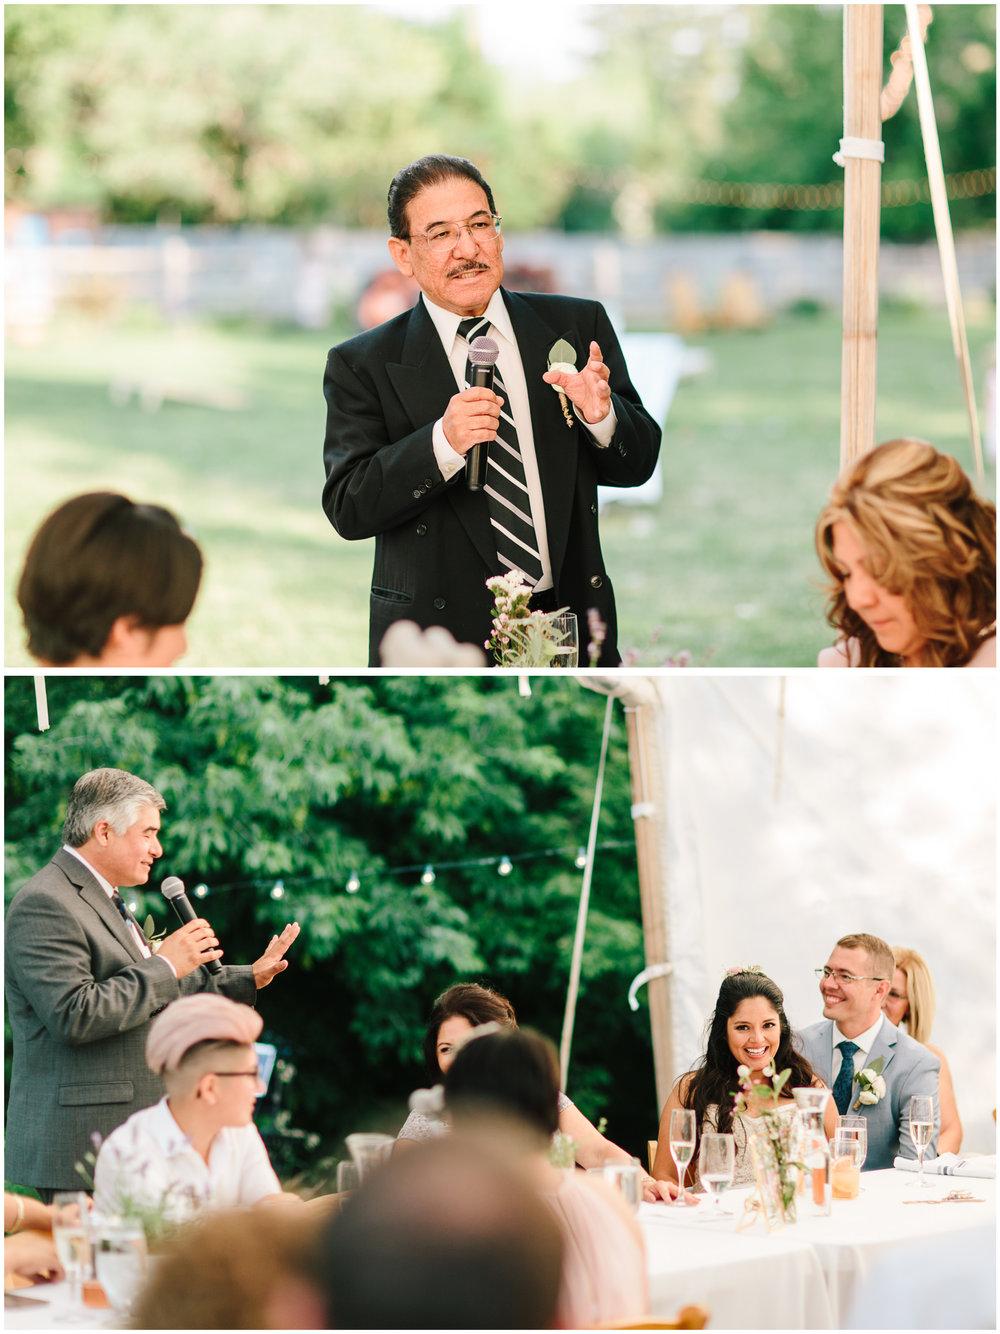 lyons_farmette_wedding_68.jpg